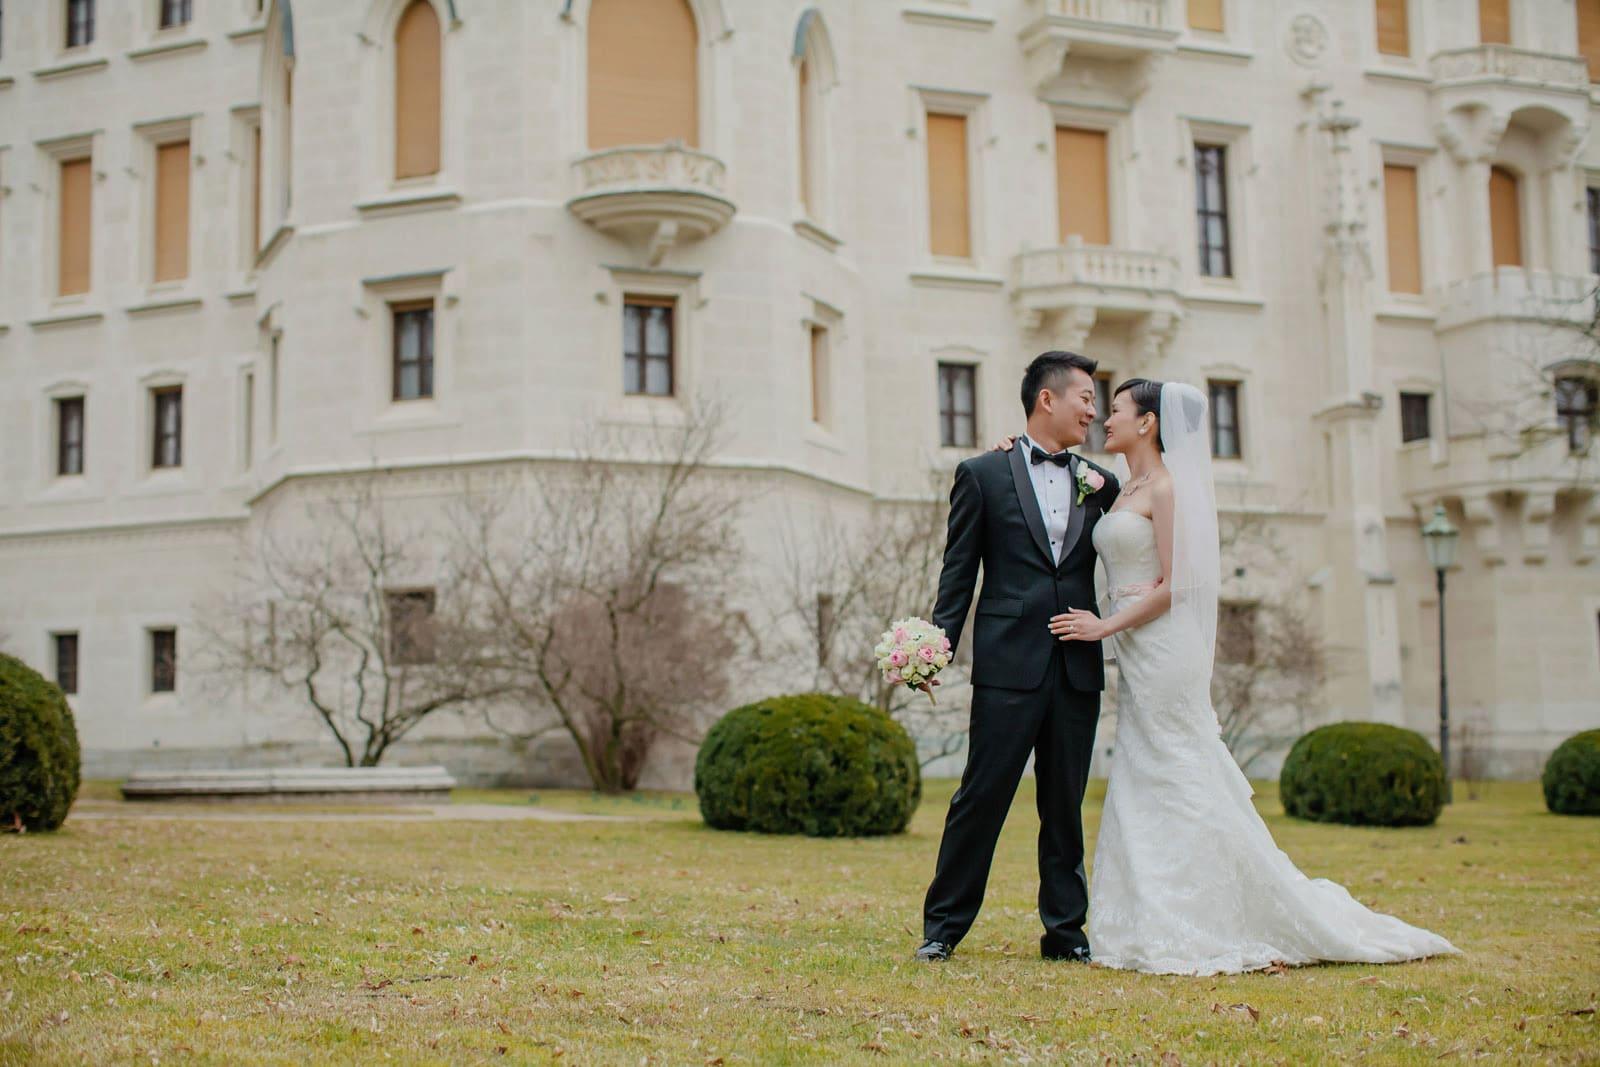 Castle Hluboka nad Vltavou wedding / Suki & Steven / wedding portrait session